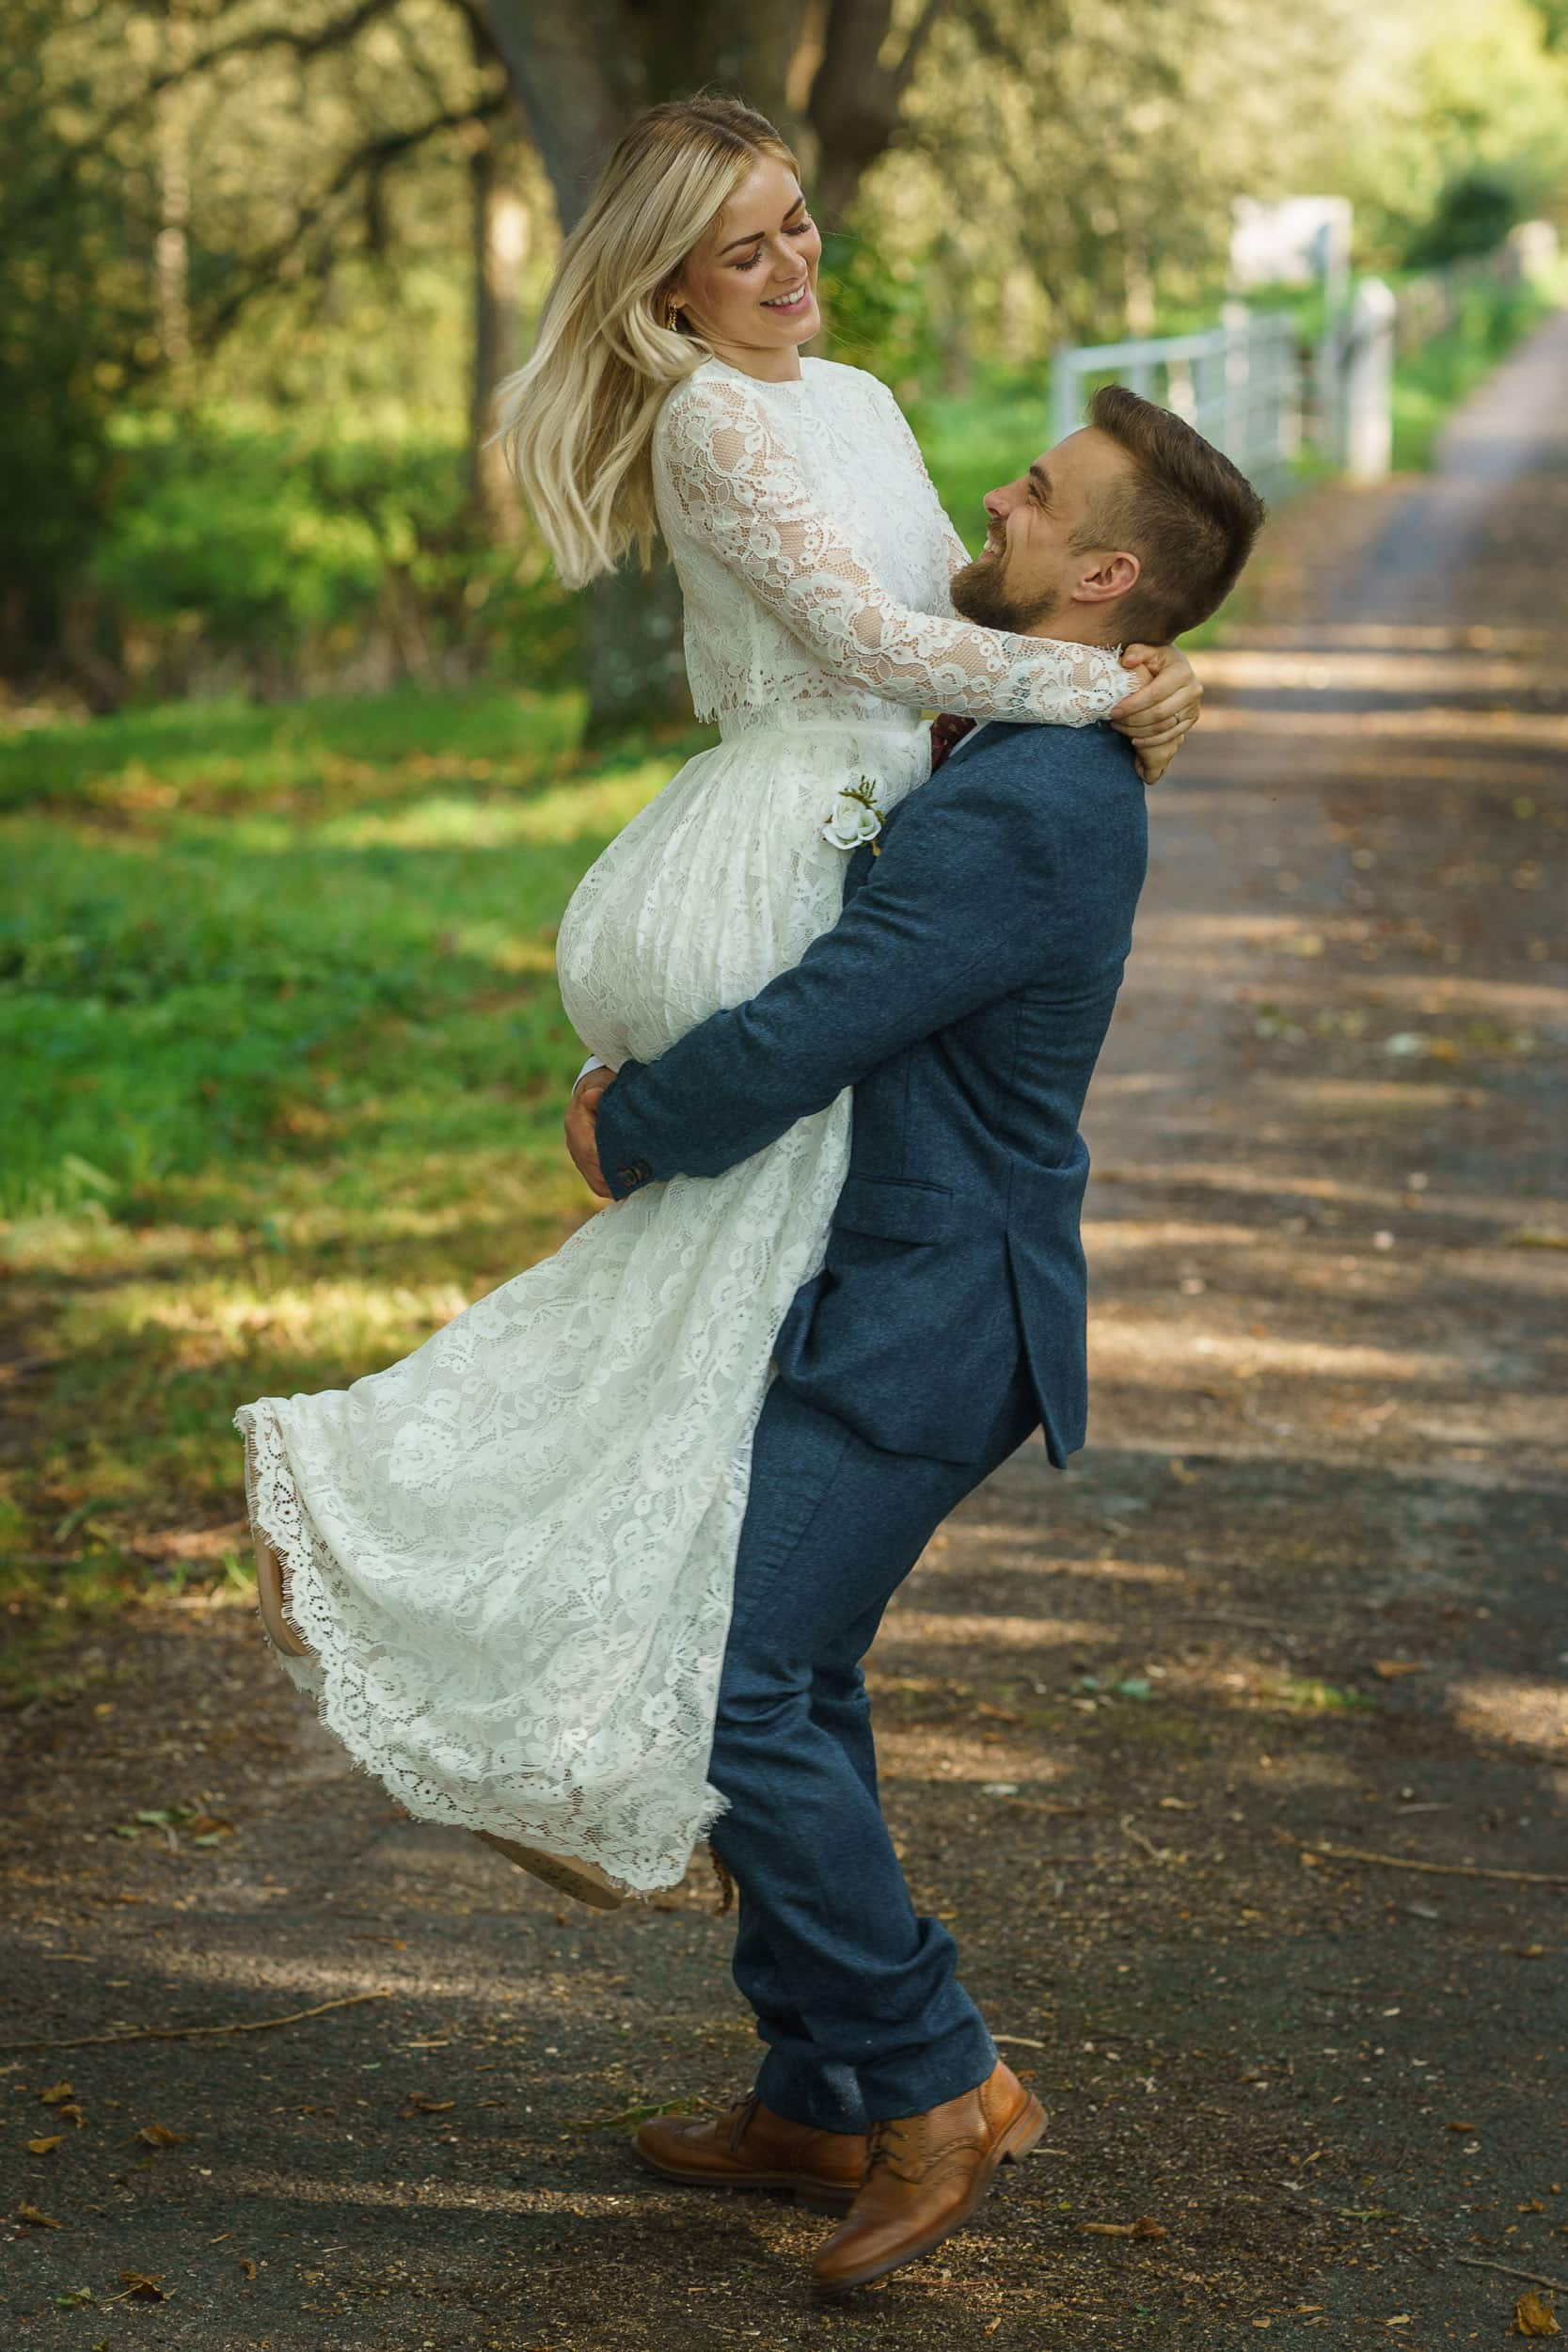 Documentary Wedding Photography - Matthew Ellacott Wedding Photographer